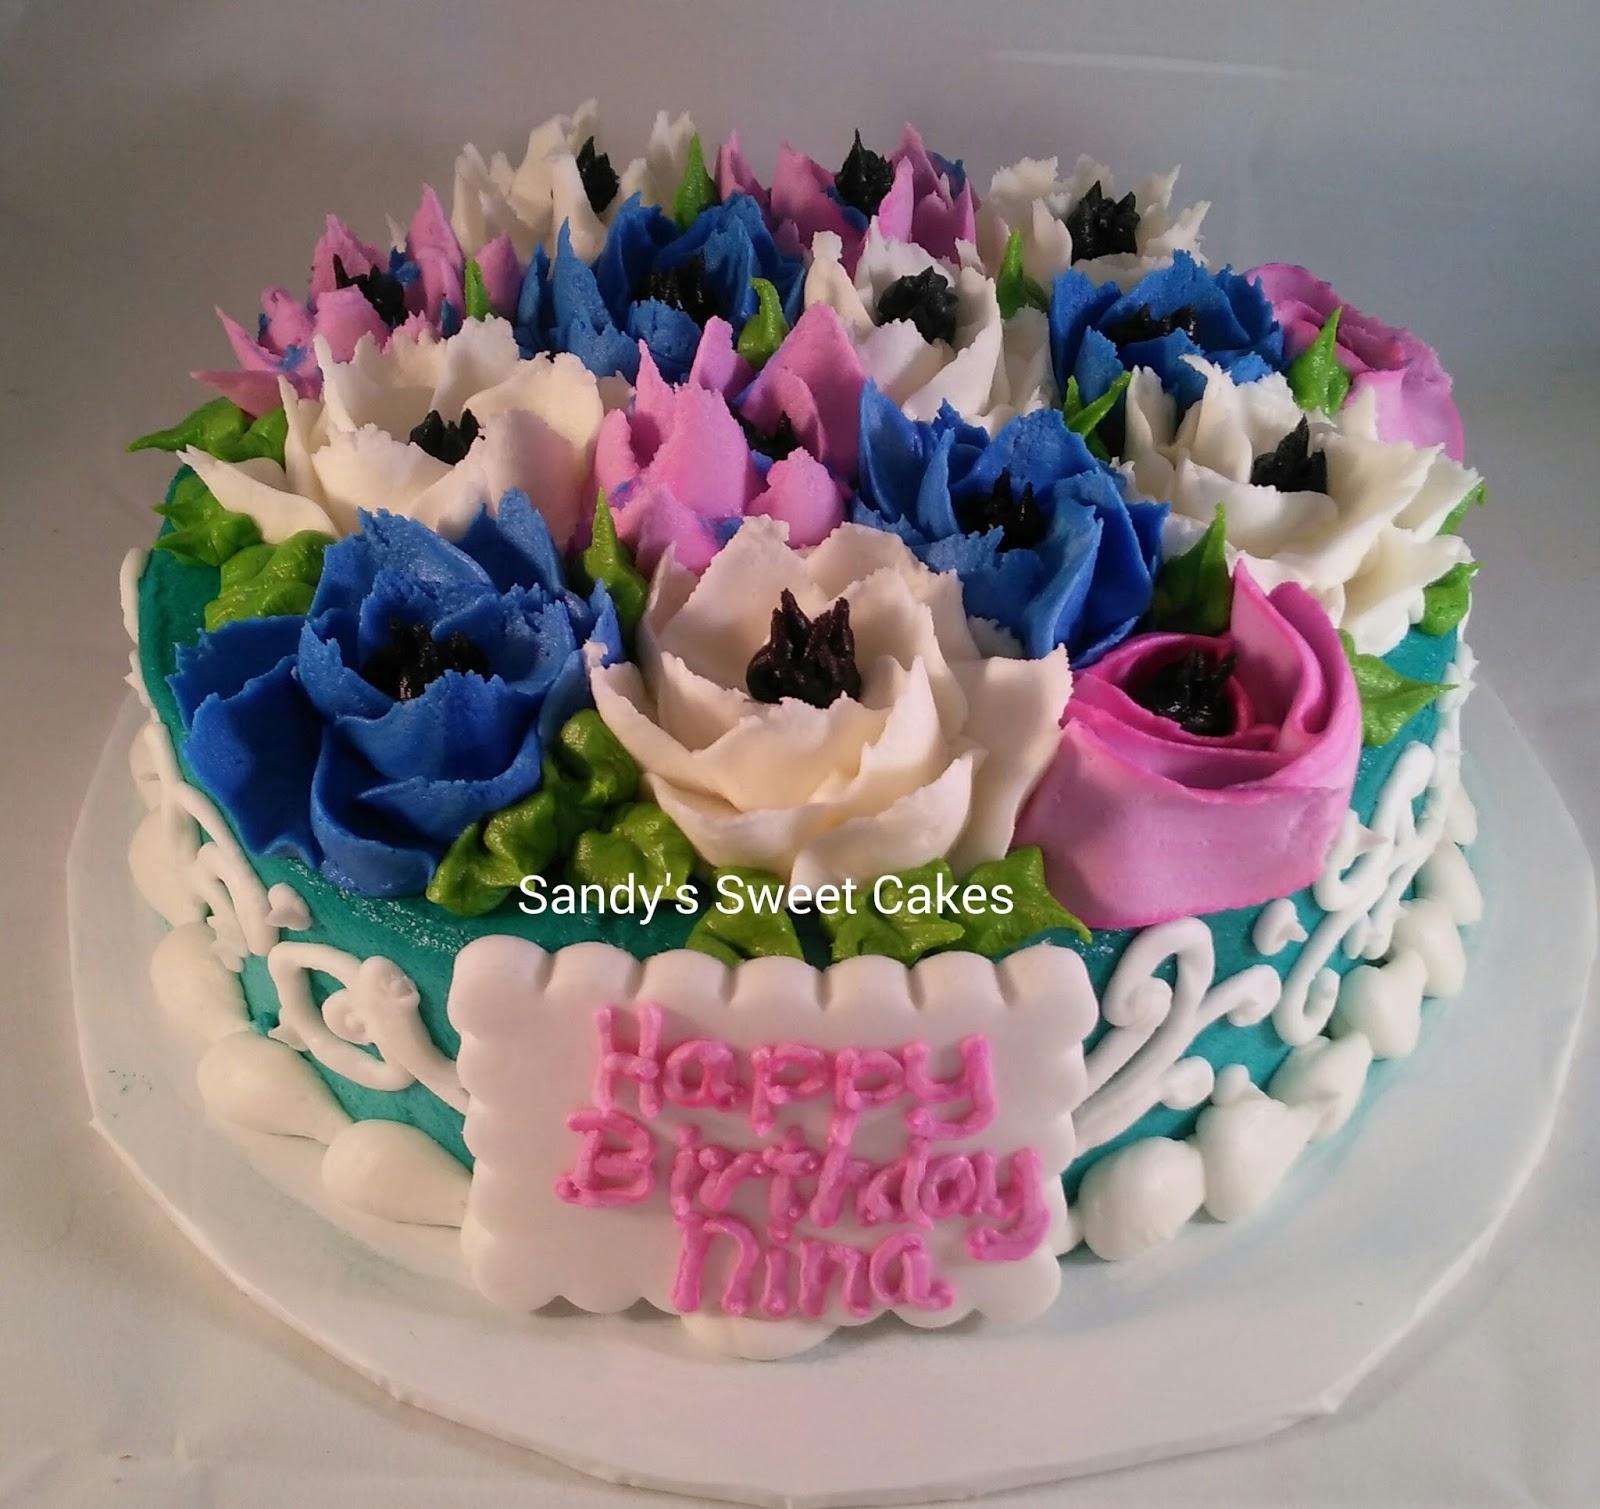 Sandys Sweet Cakes